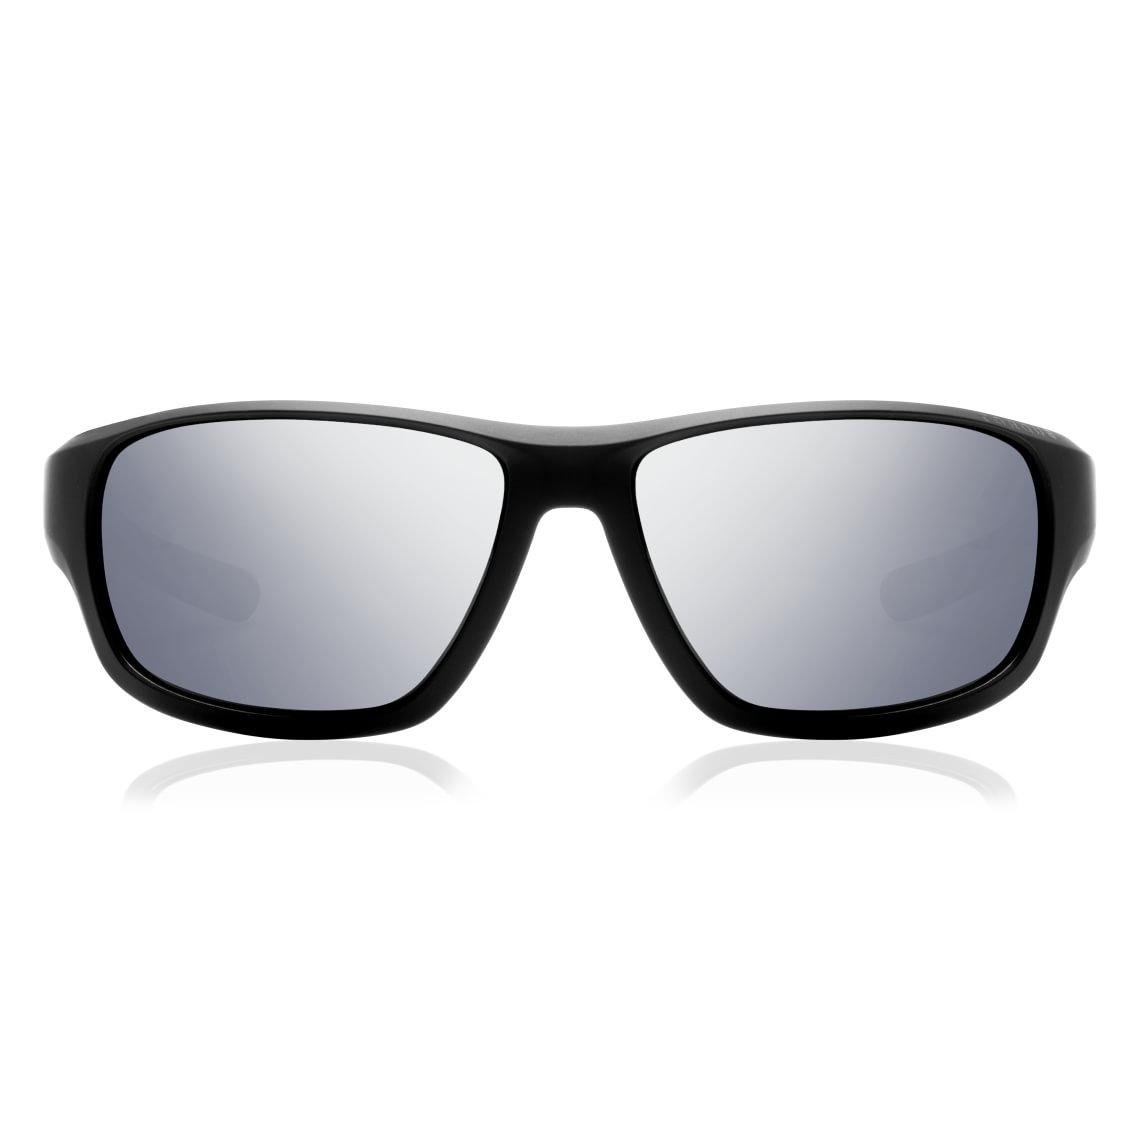 Henrik Stenson Eyewear Torque Black